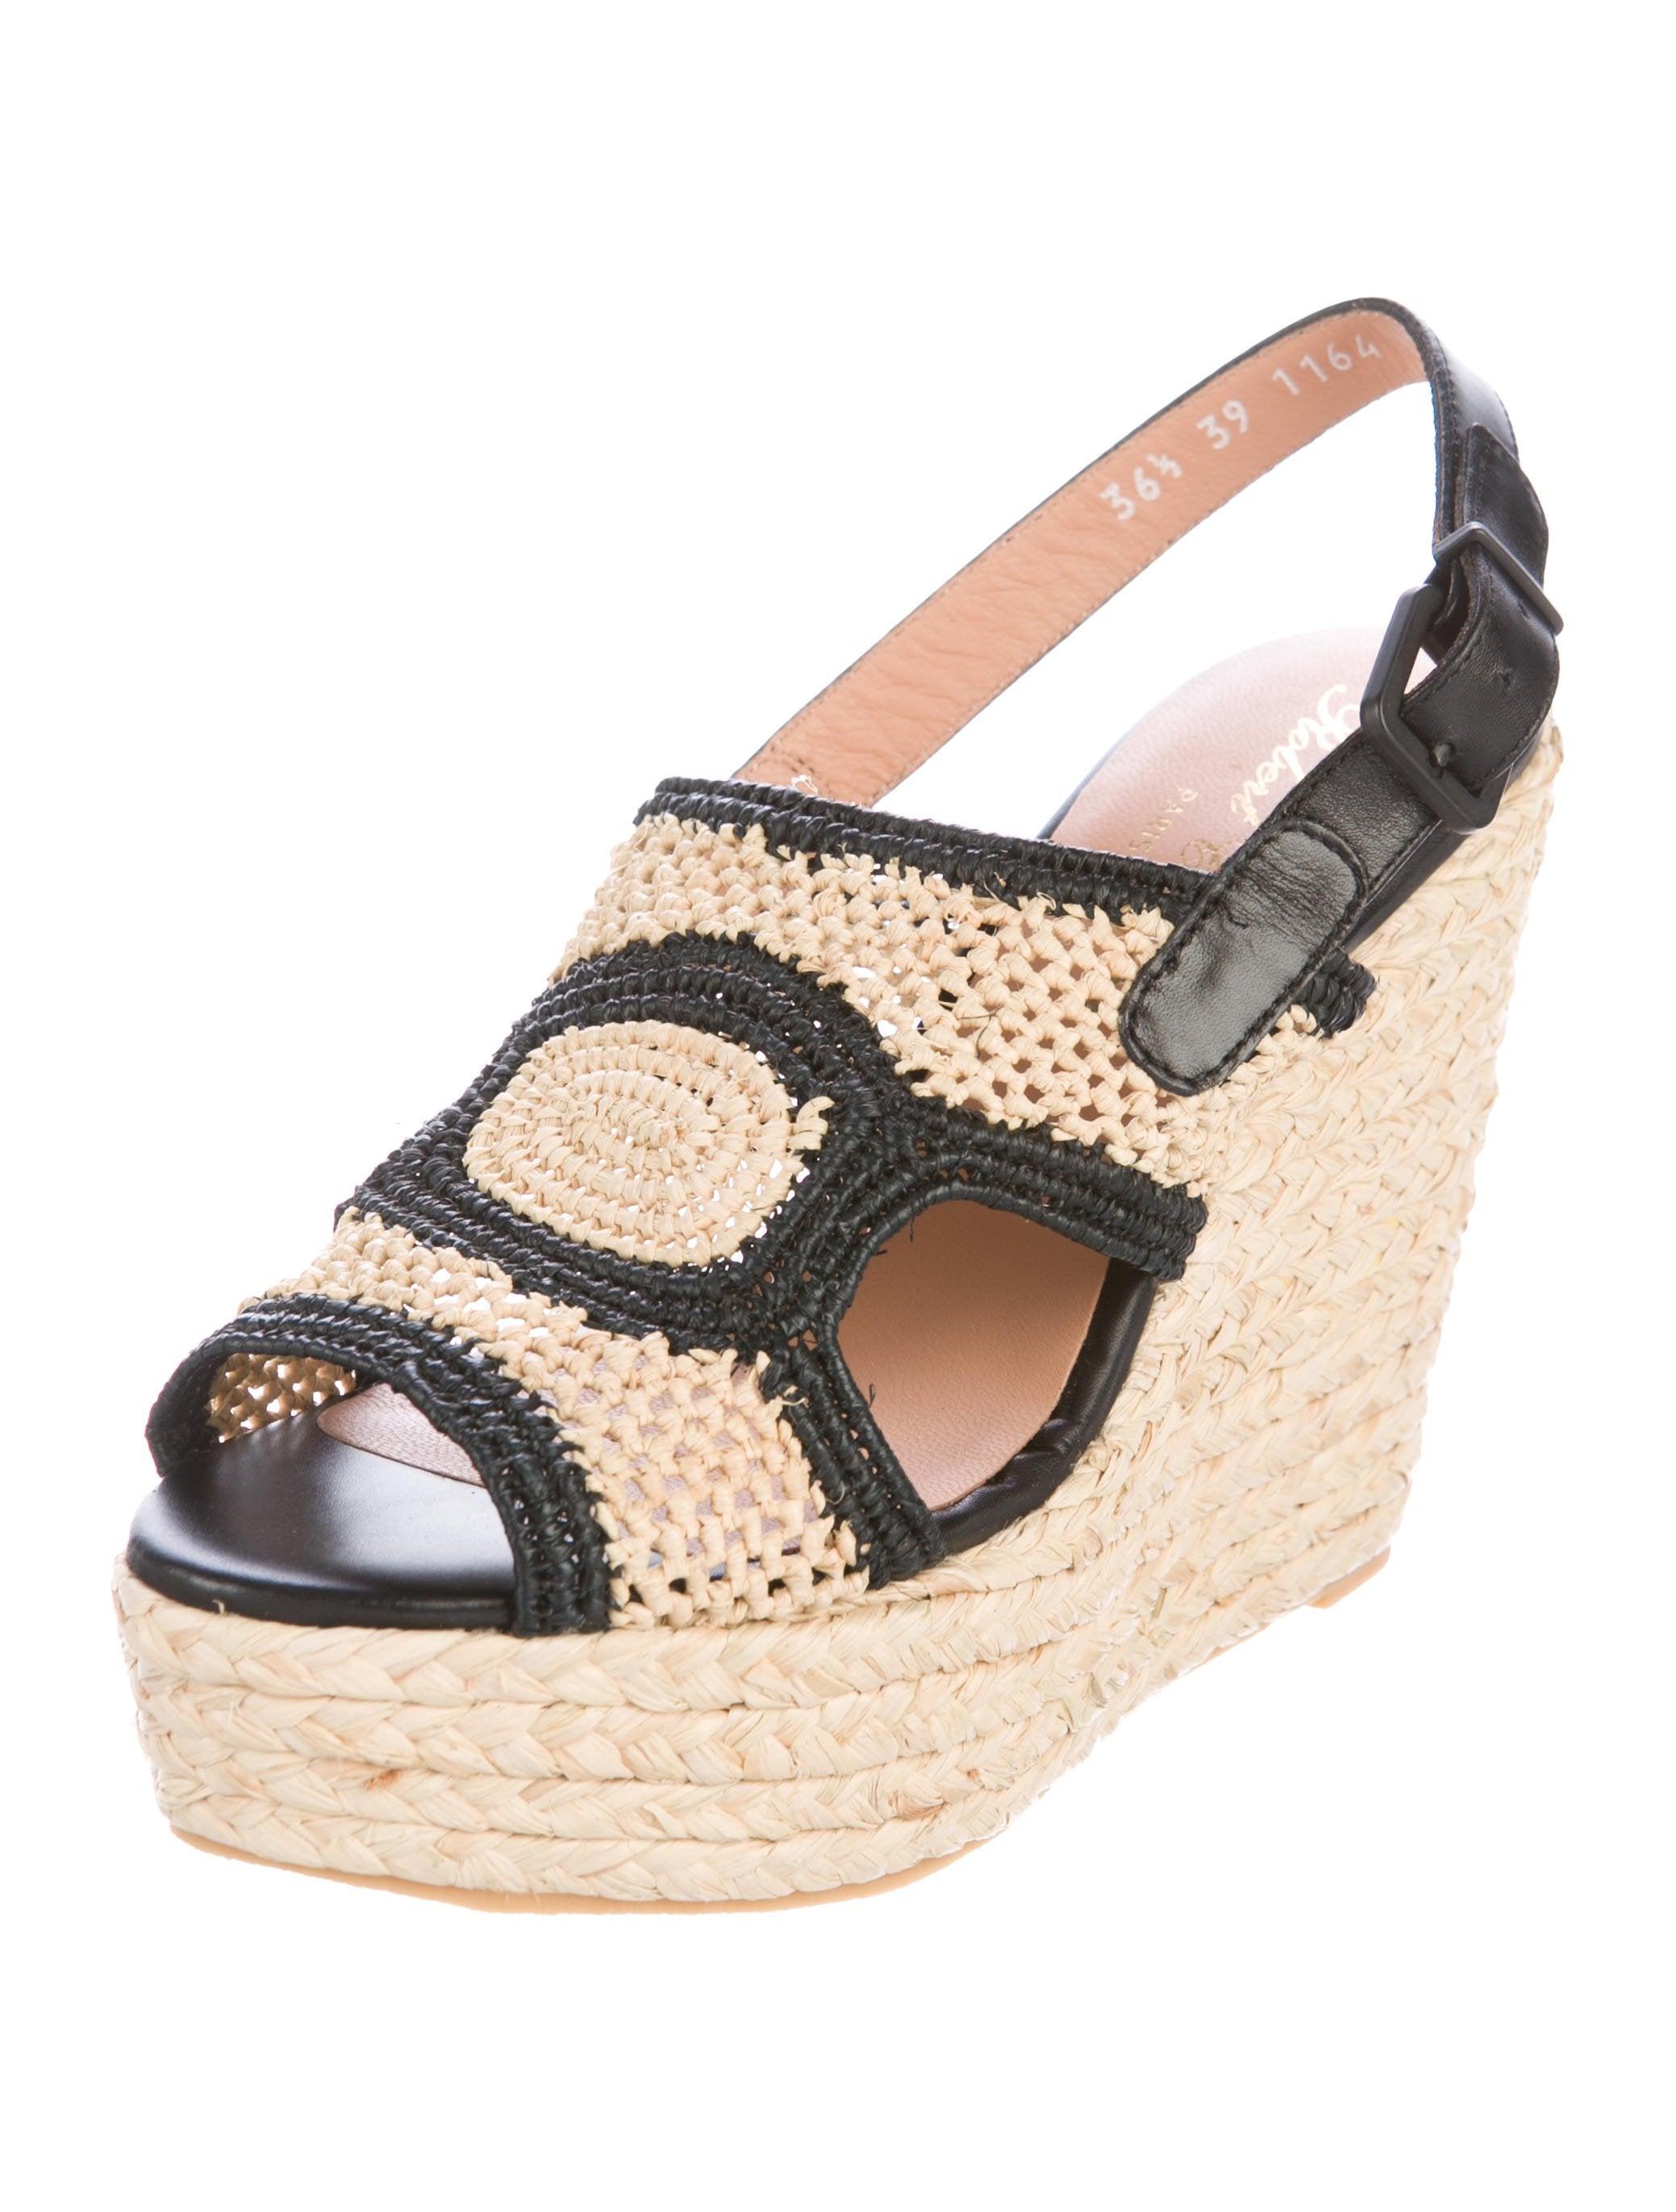 Robert Clergerie Drastic Raffia Sandals w/ Tags sale choice 1wJjh